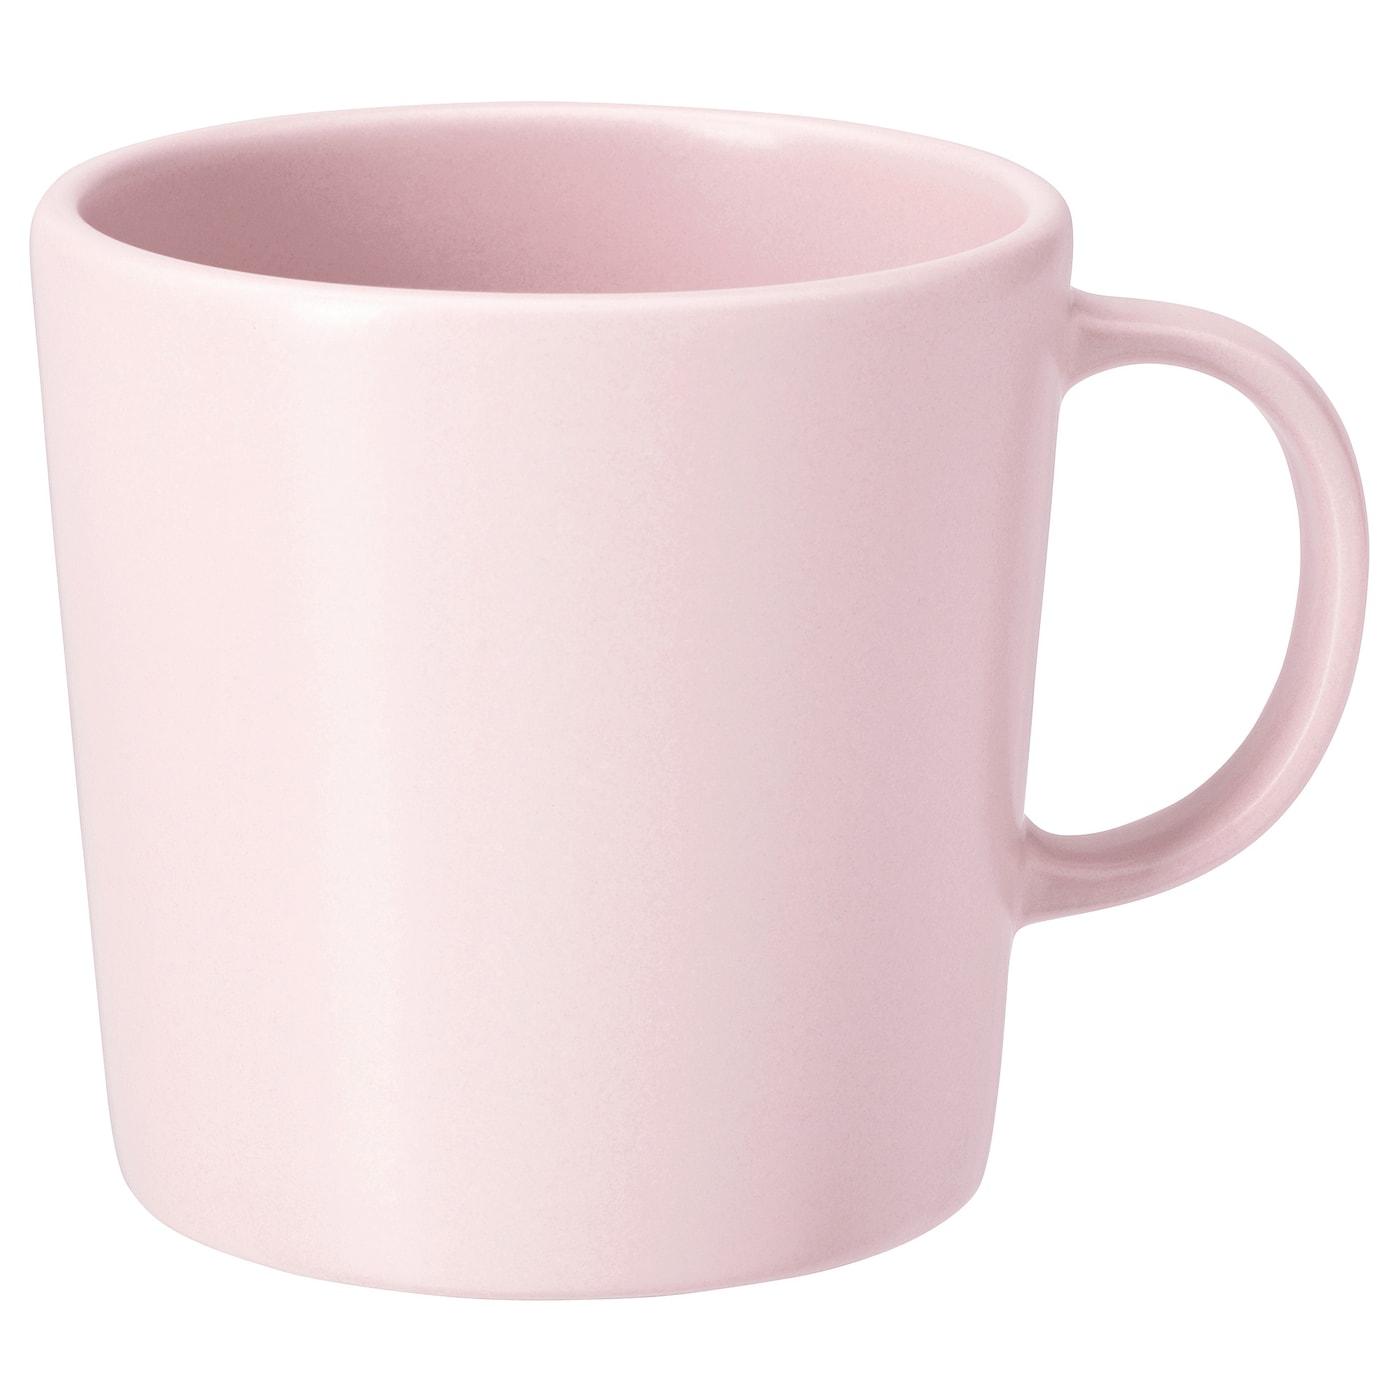 Dinera Mug Light Pink Ikea